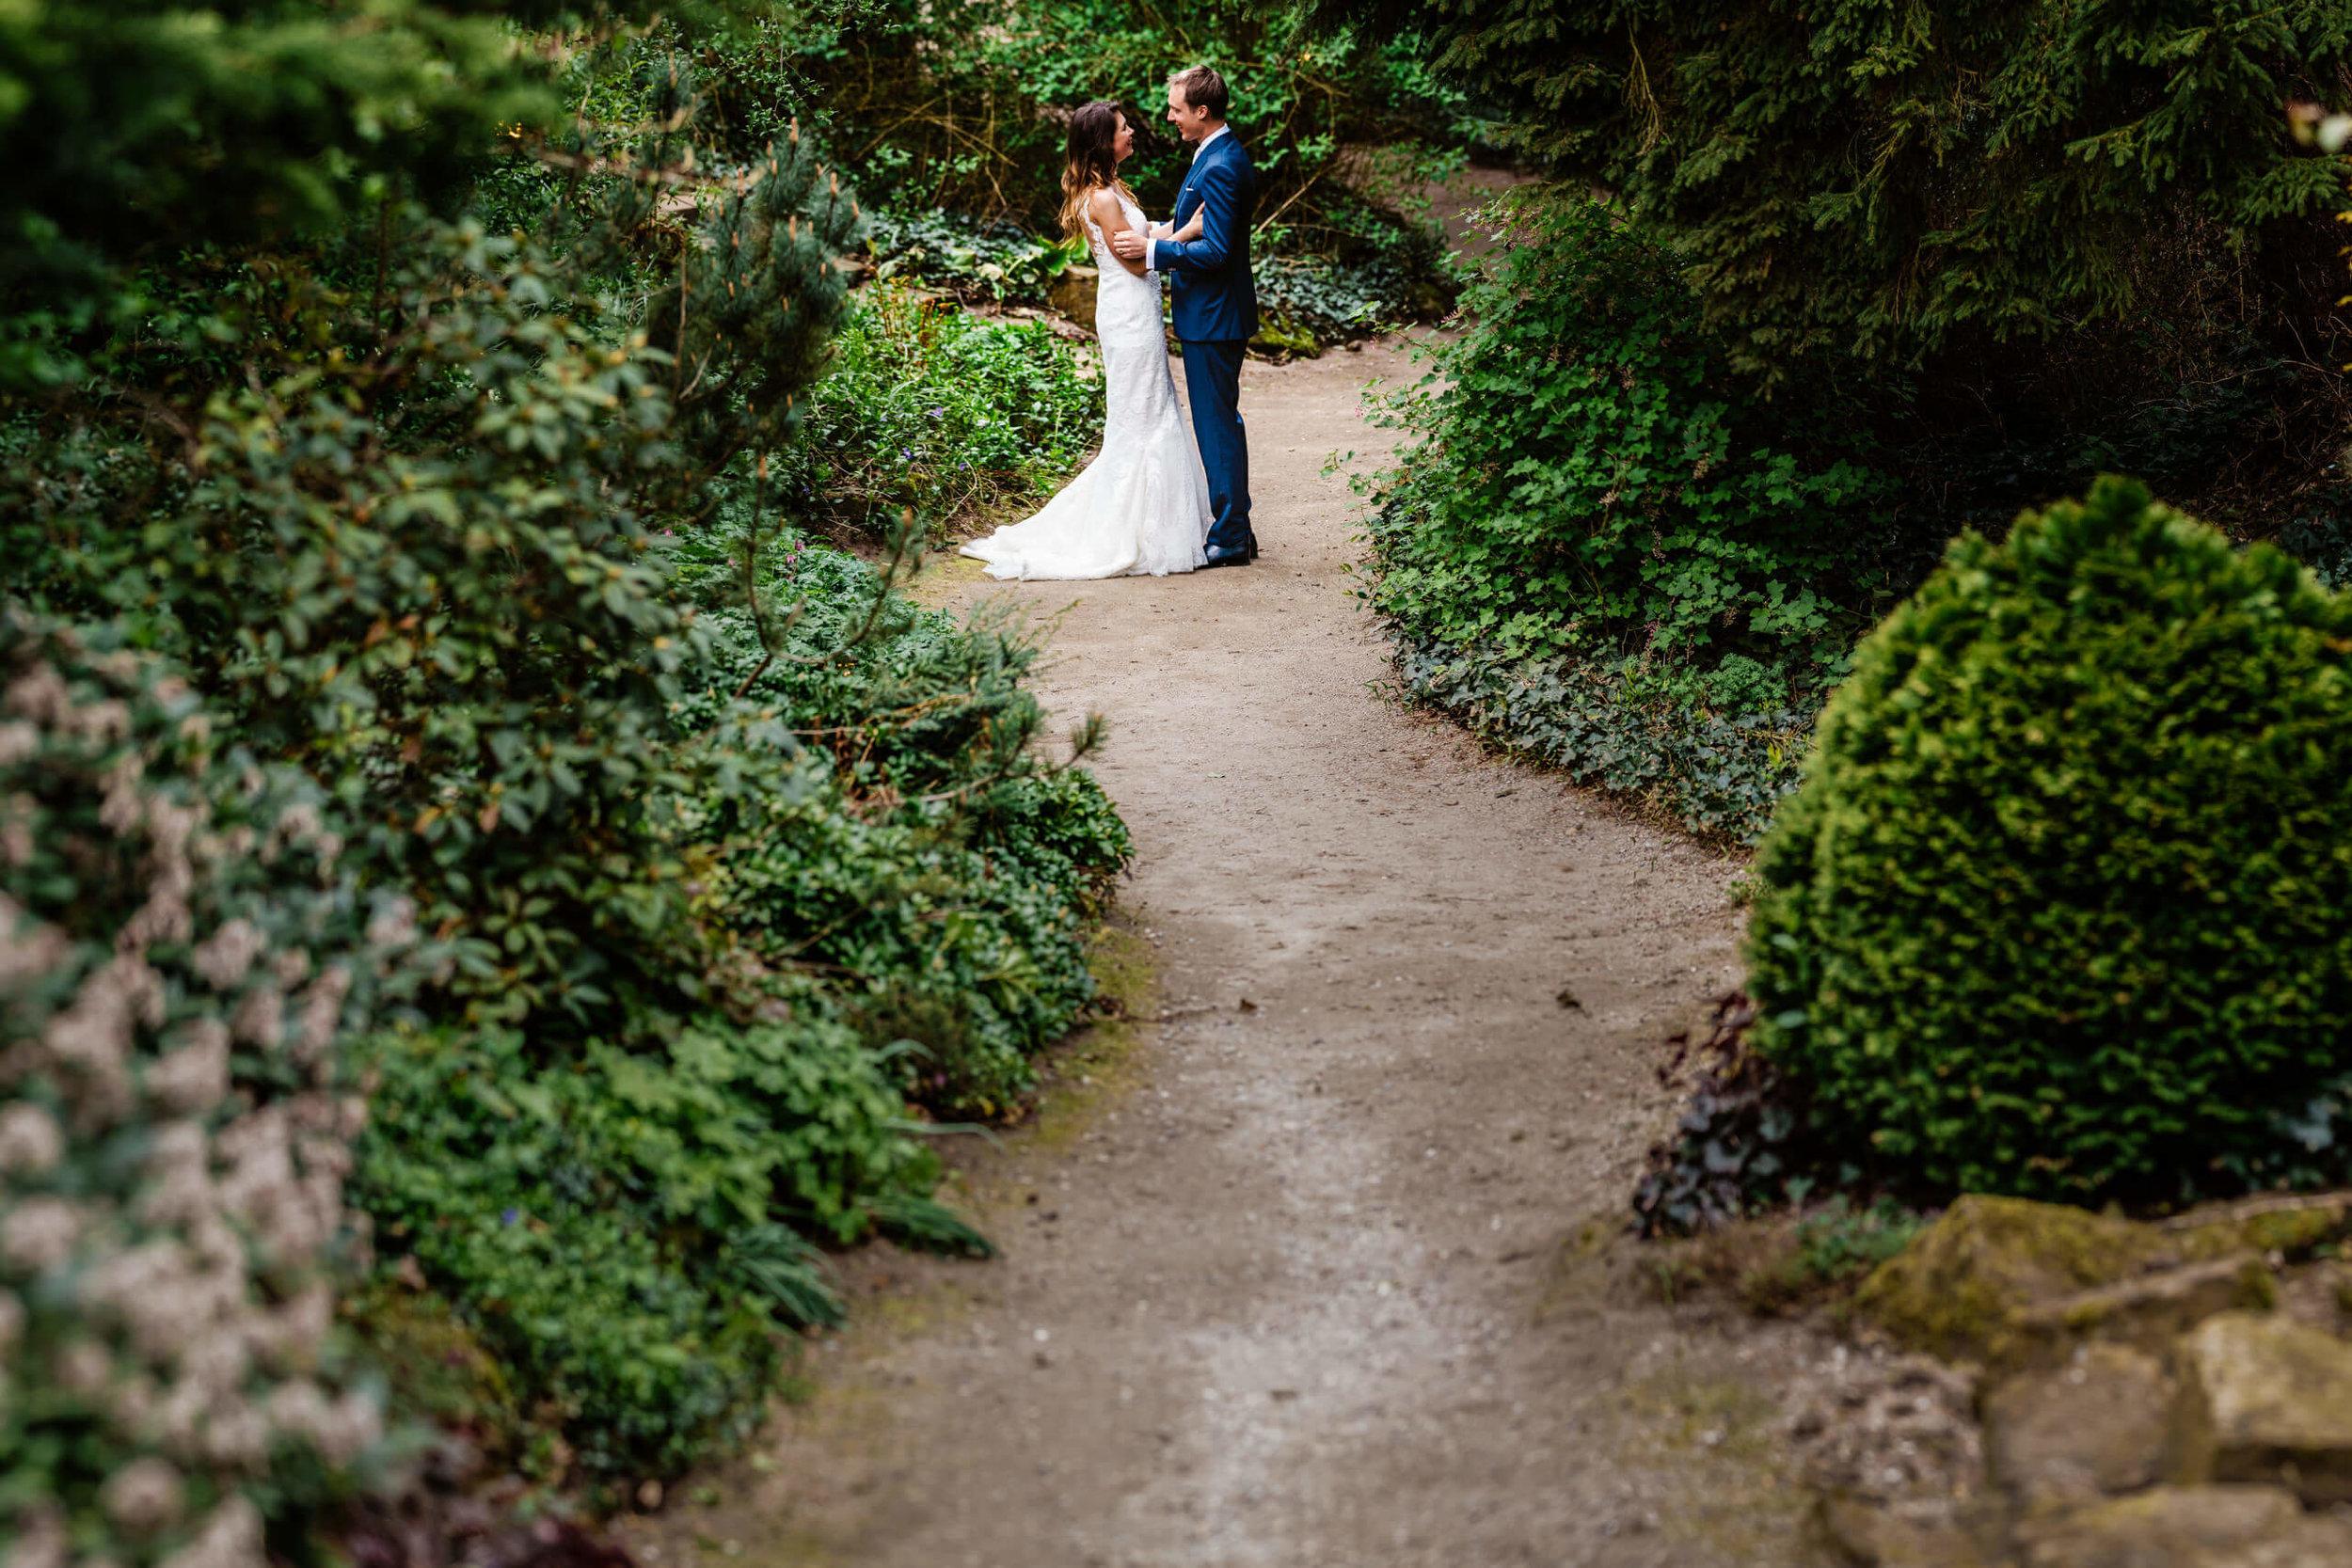 bruidsfotograaf-landgoed-groot-warnsborn-25.jpg